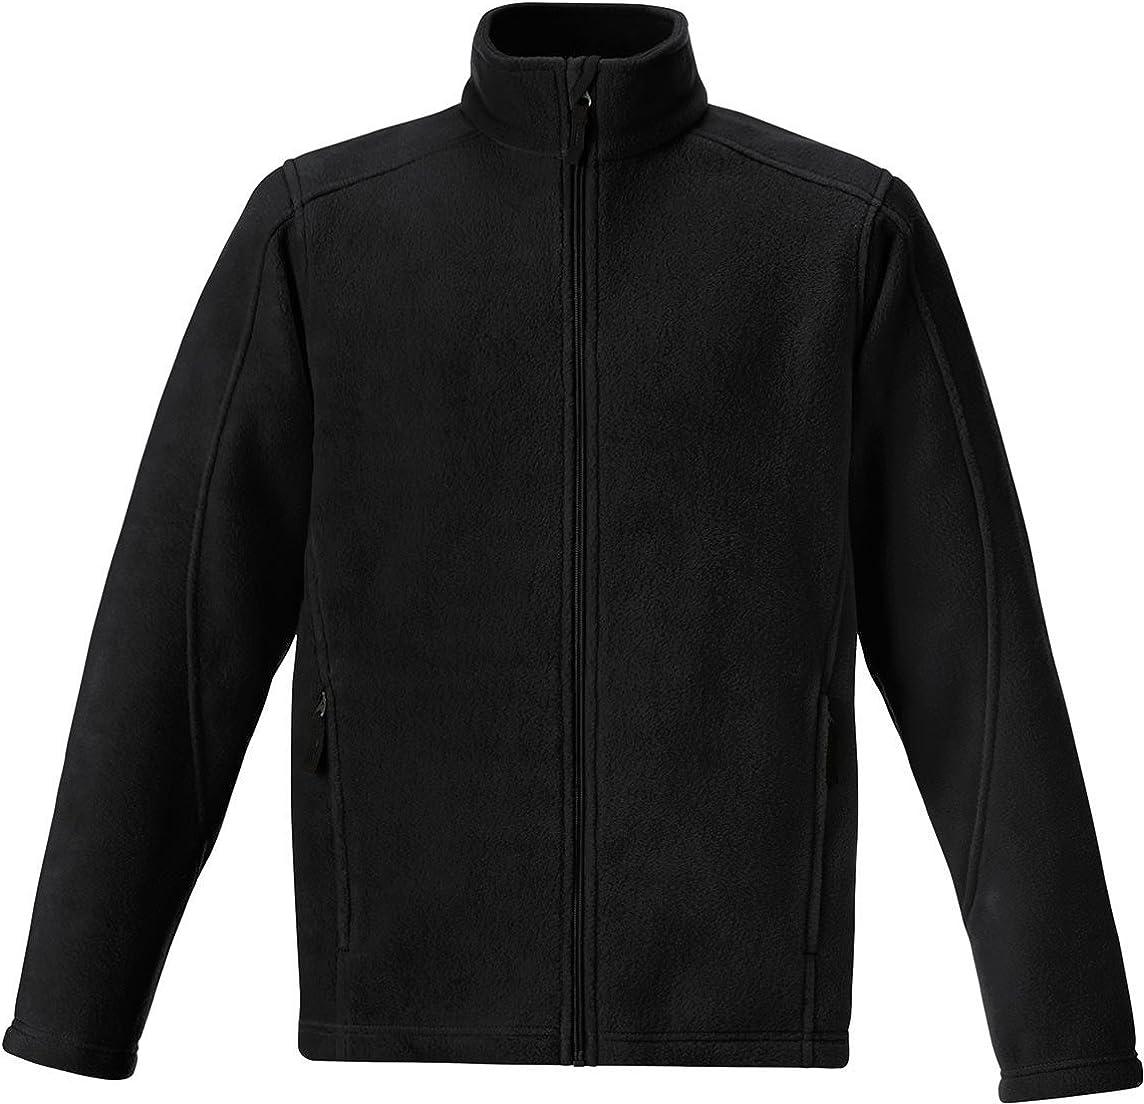 Ash City - Core 365 Core 365 JourneyMen's Anti-Pill Fleece Jacket